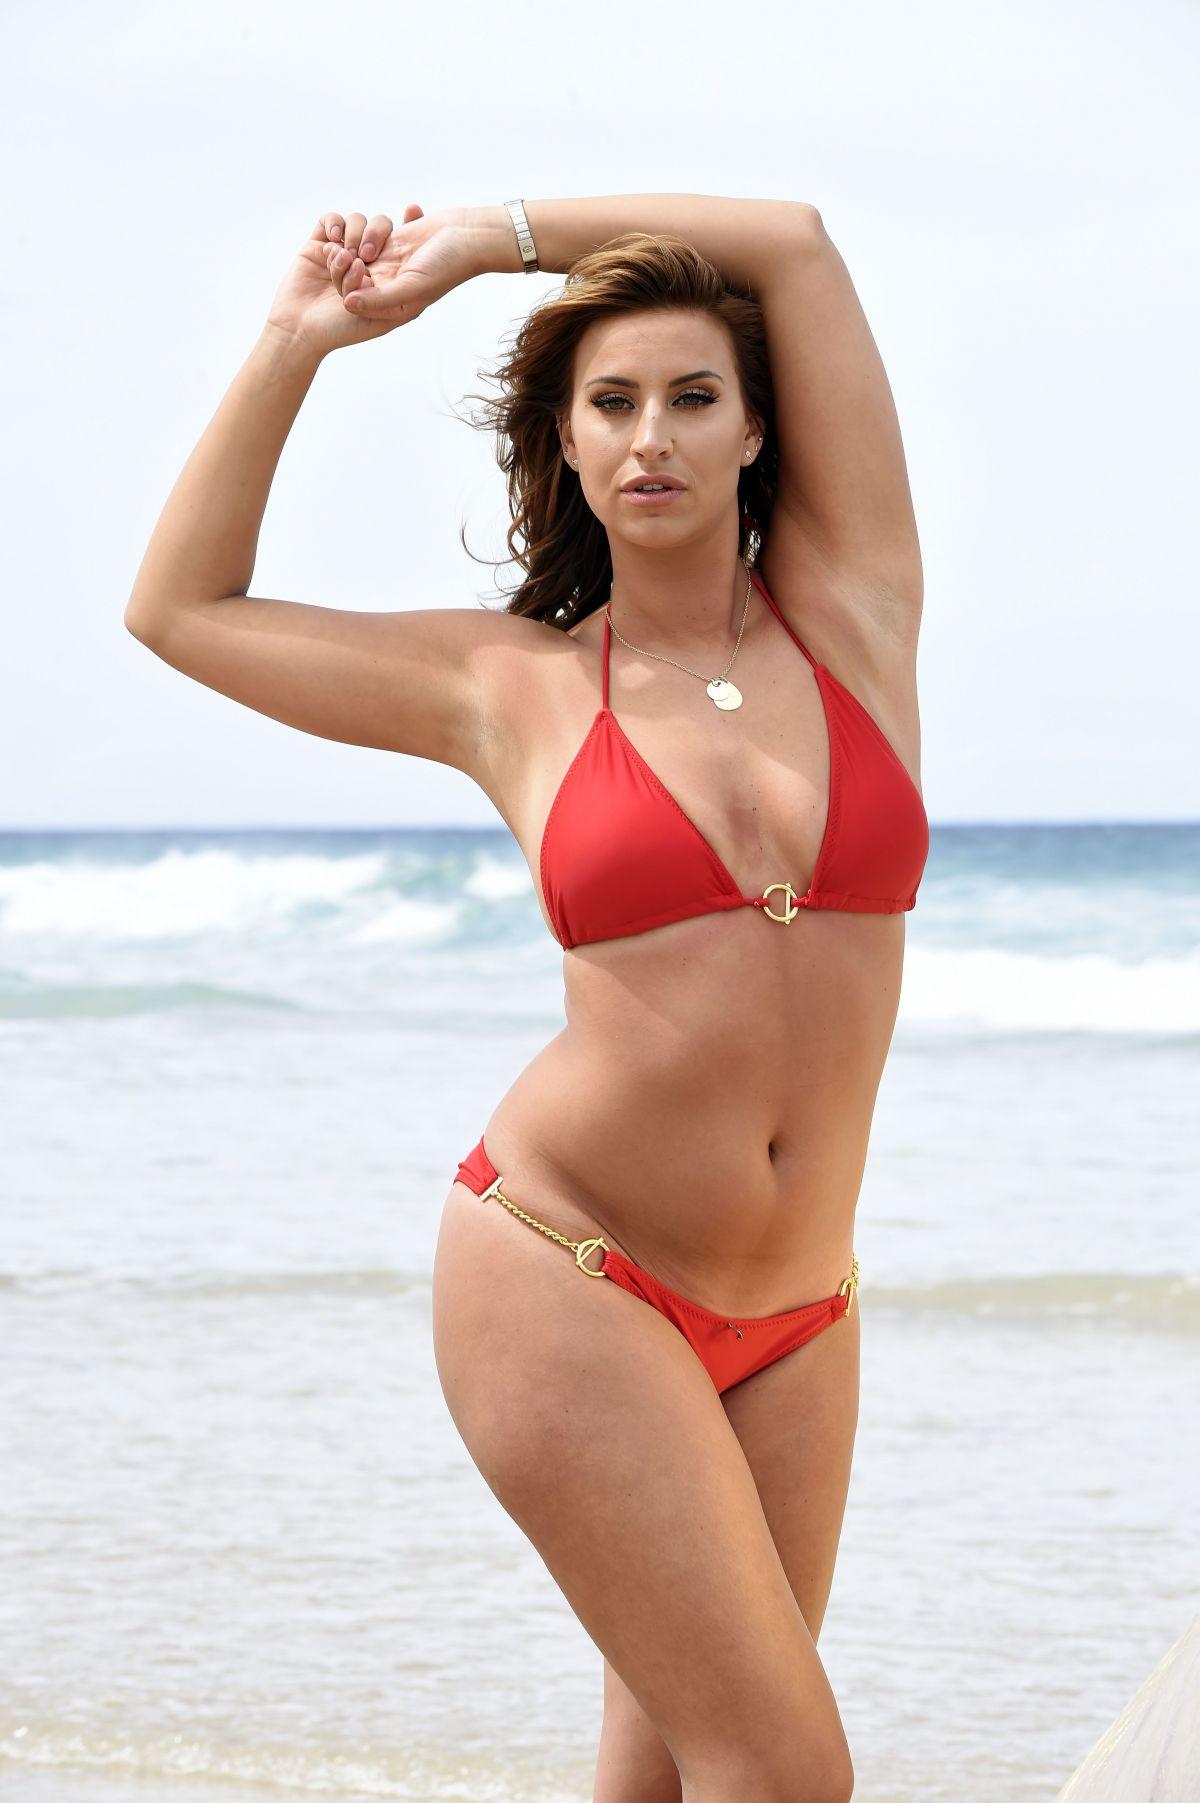 Girls bikini photo shoot images 790